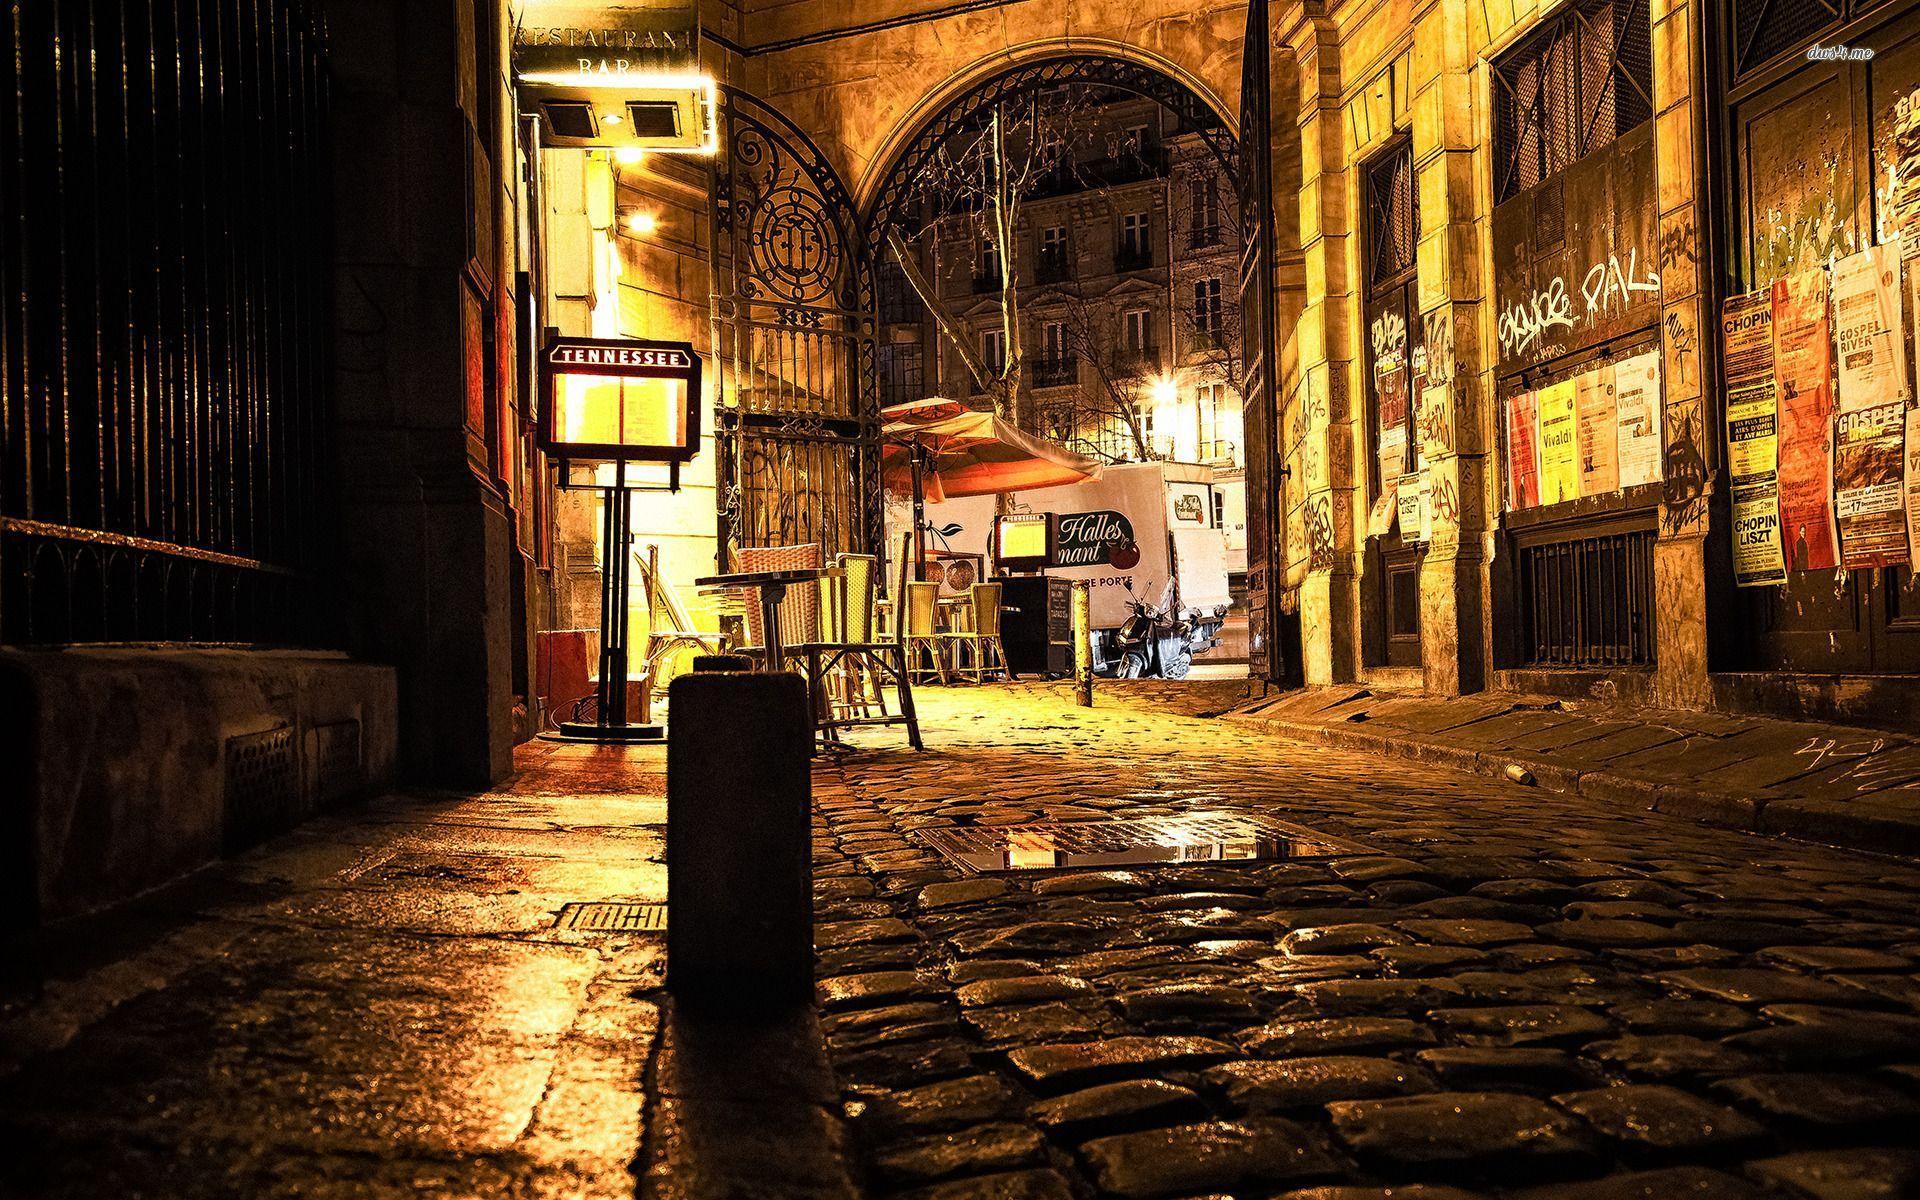 Paris Street Wallpapers Top Free Paris Street Backgrounds Wallpaperaccess